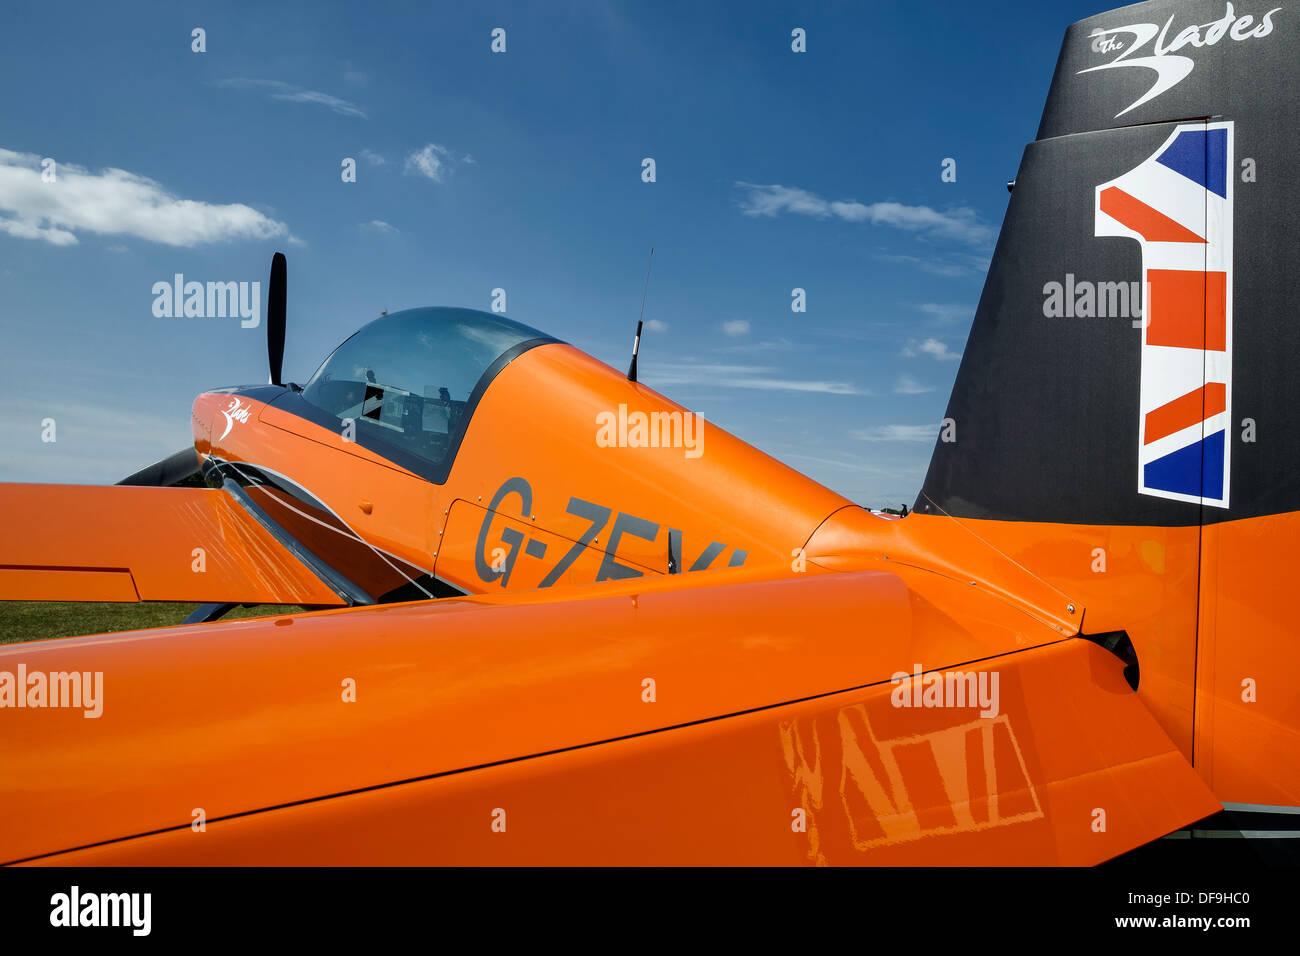 A Walter Extra EA300 aerobatic aircraft of the Blades aerobatic team - Stock Image